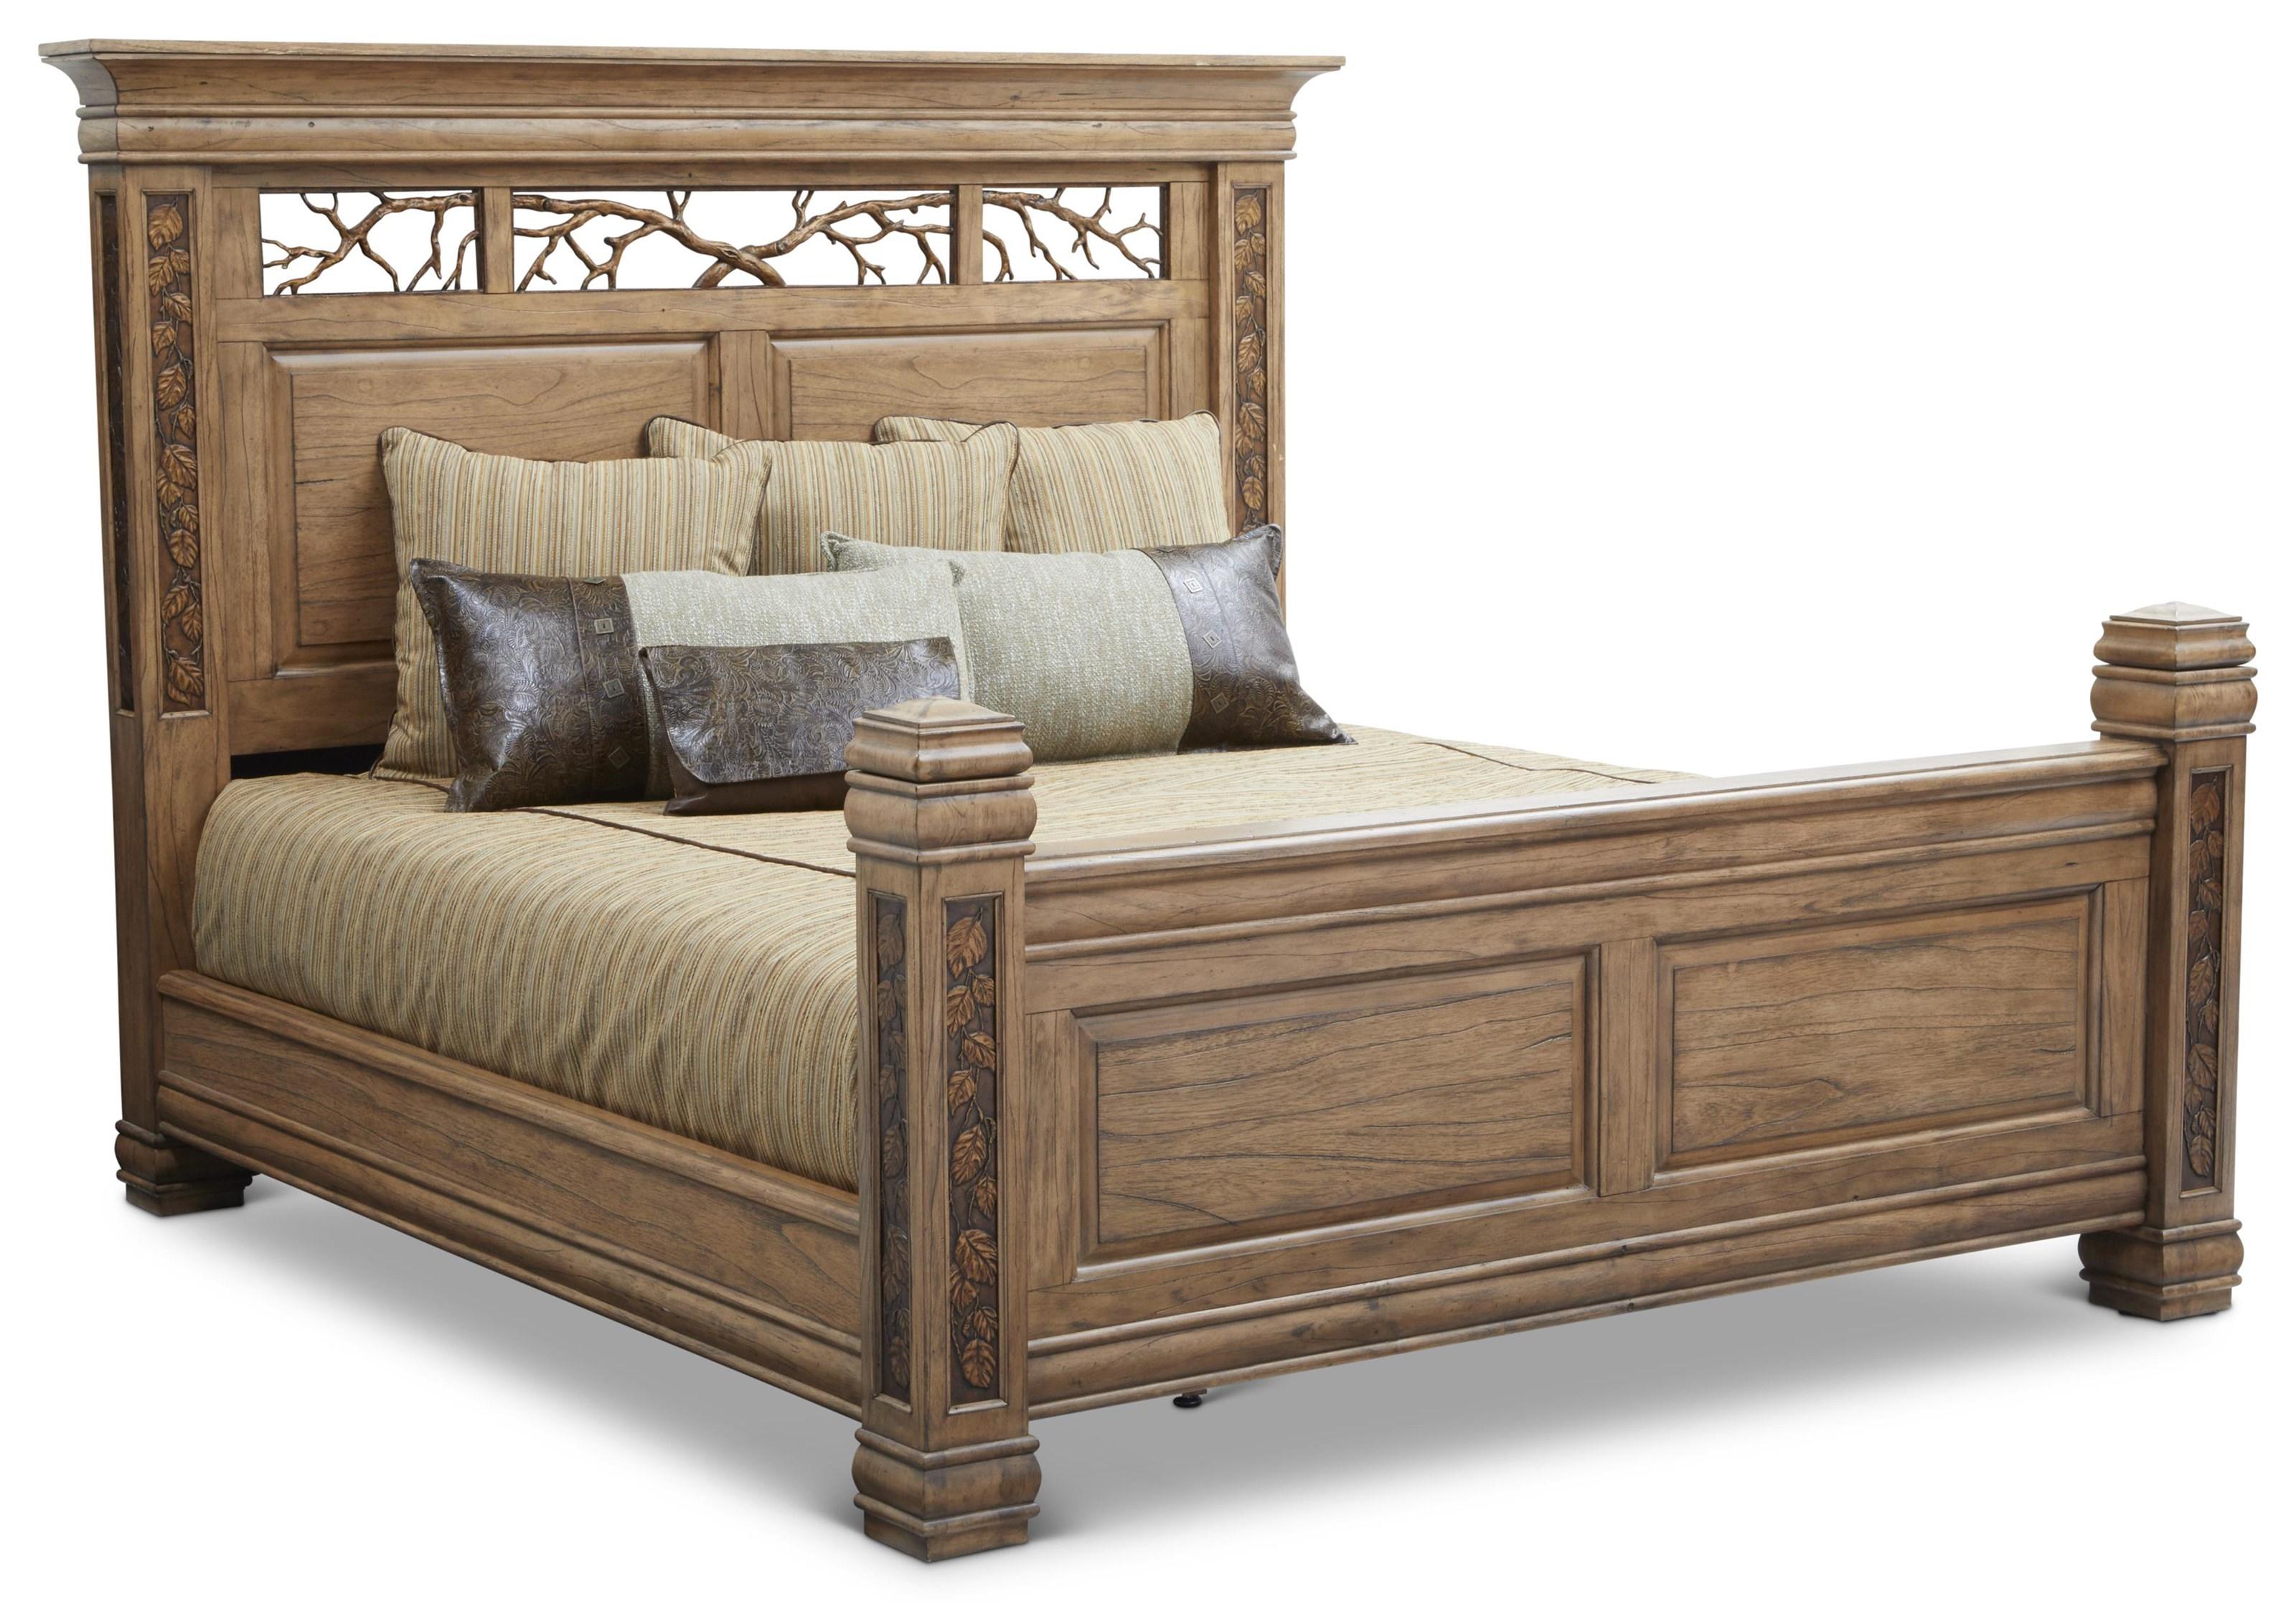 King Bed by Woodbrook Designs